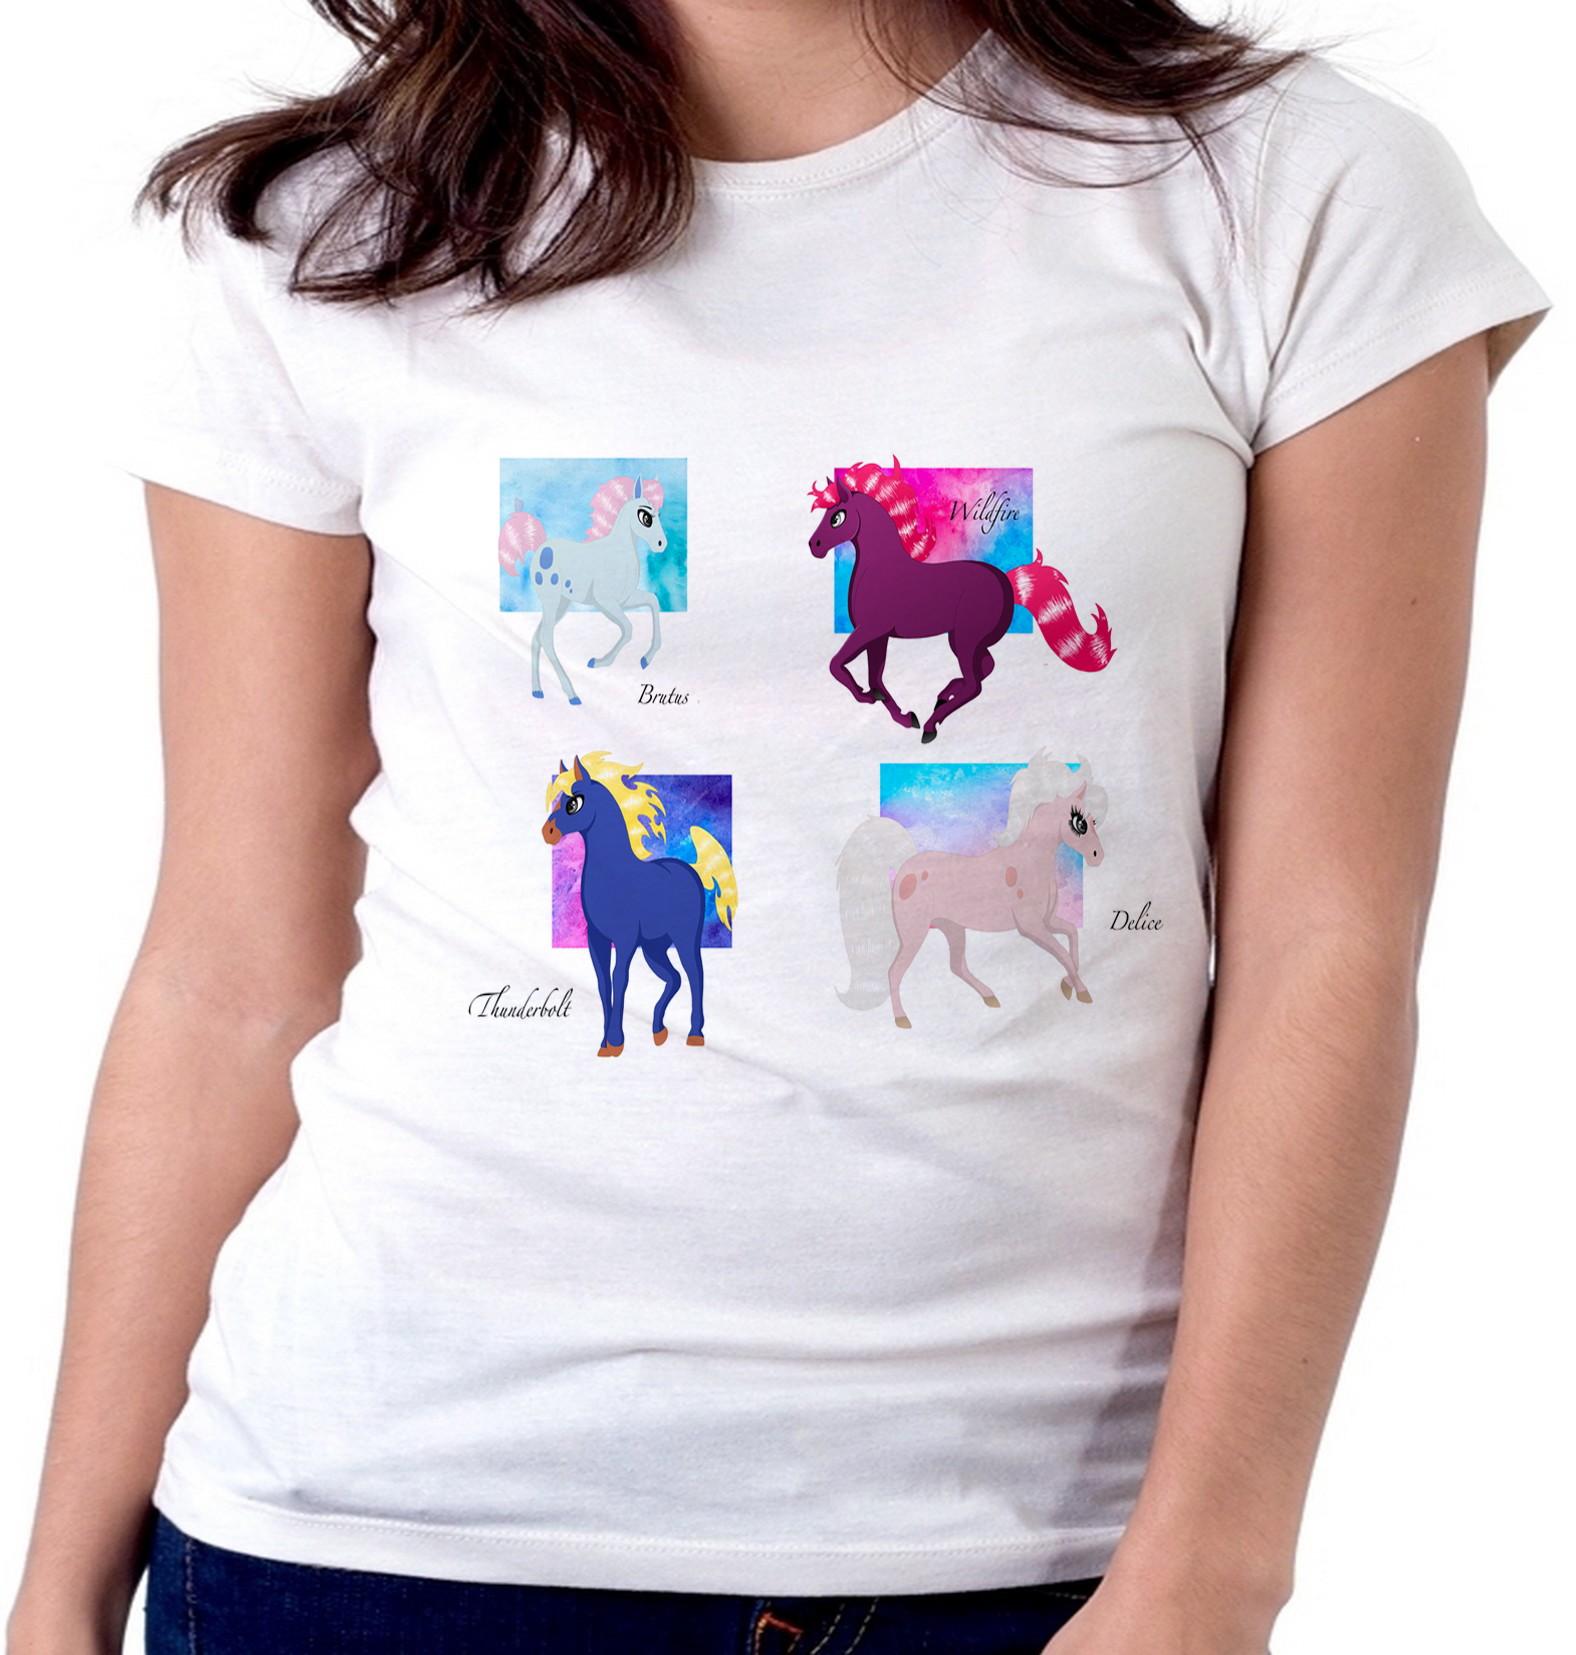 ac6cbbc4de blusa feminina baby look 4 cavalos cavalo de fogo princesa no Elo7 ...